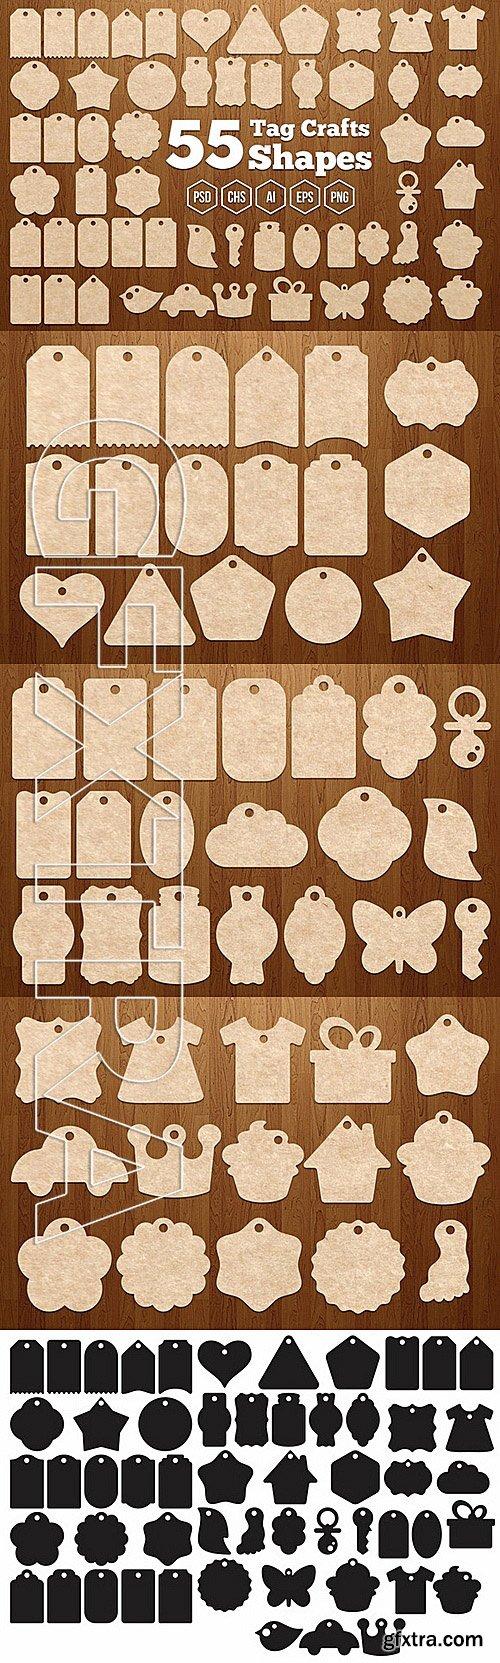 CM - 55 Tag Crafts Shapes 337524